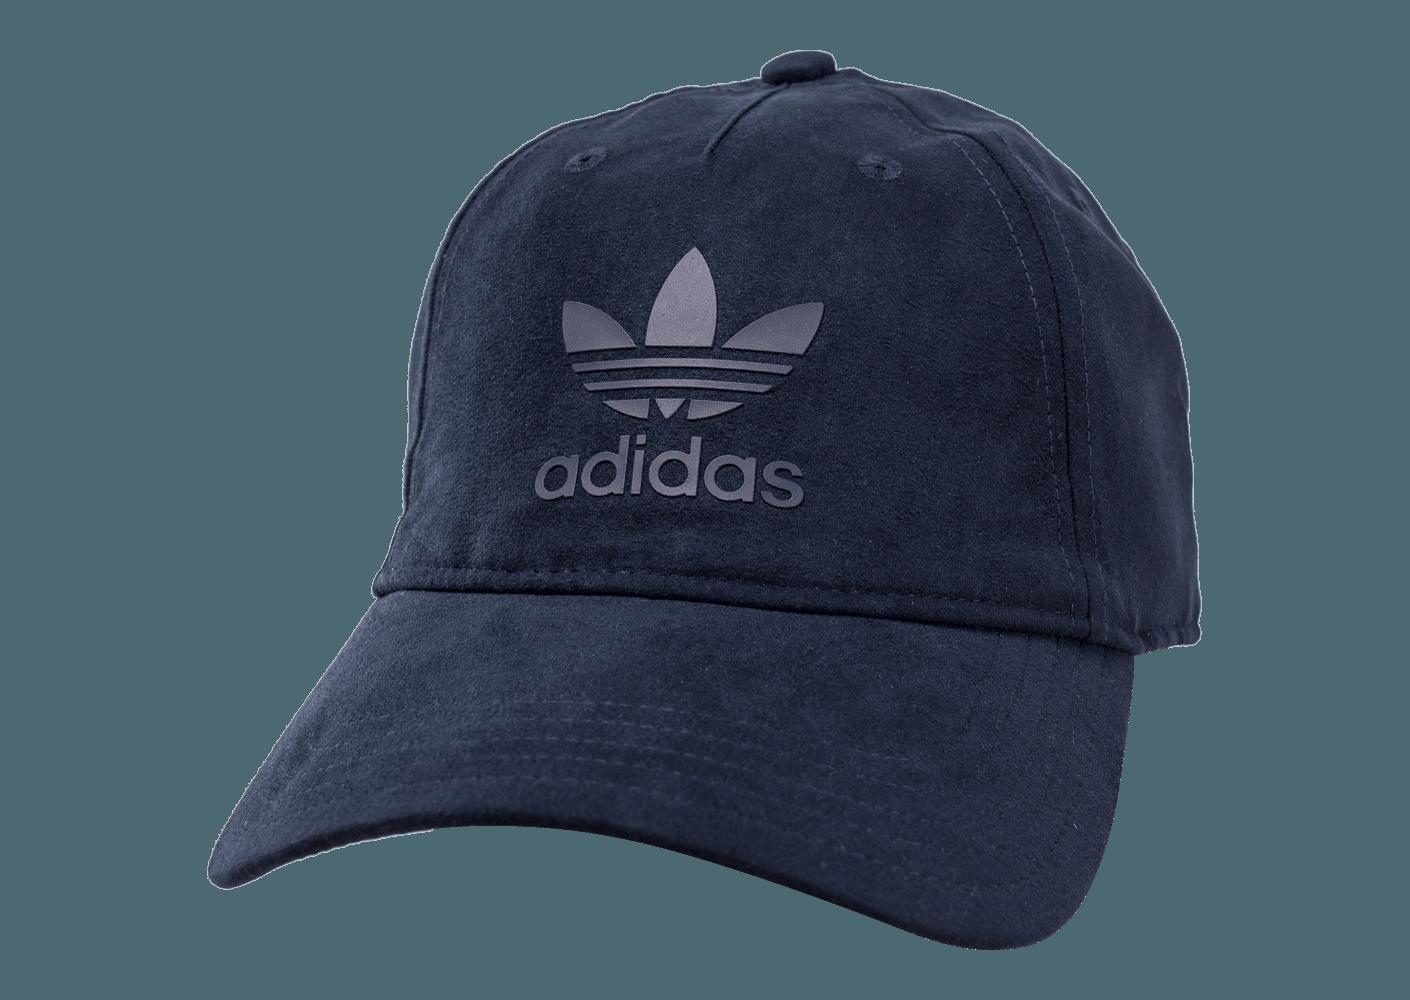 adidas originals ay9006 casquette avec galon à 5